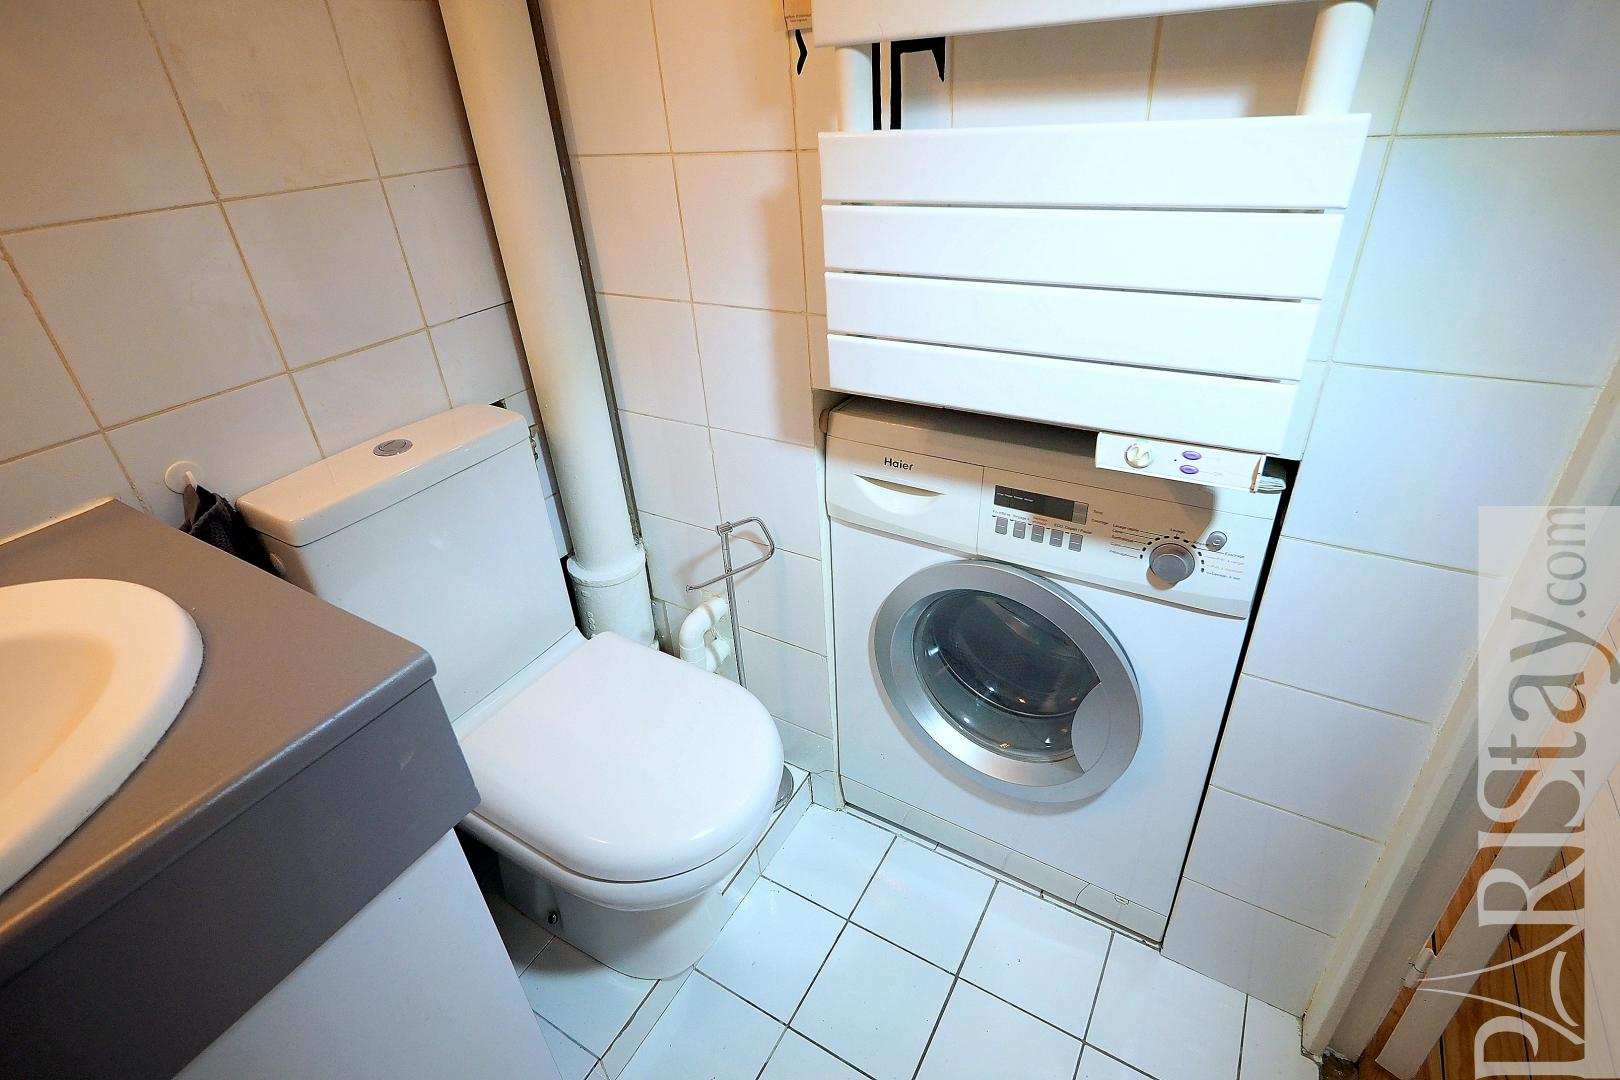 Apartment rental paris latin quarter one bedroom 75005 saint michel